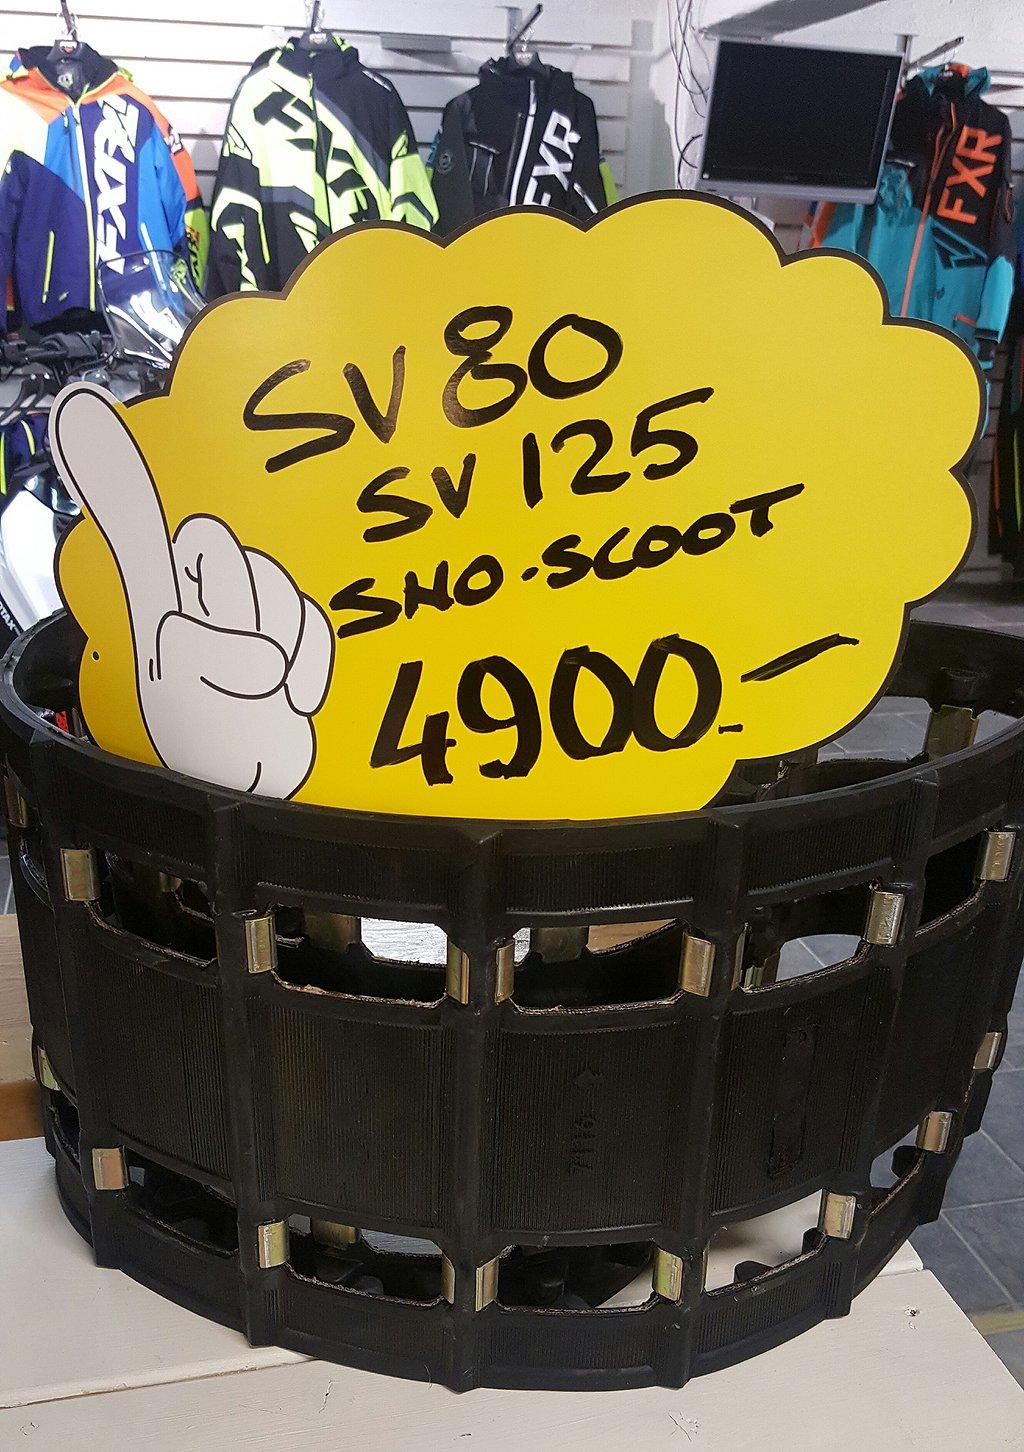 Yamaha Barnskoter mattor SV80/SV125 NYA MATTOR,sno-scoot